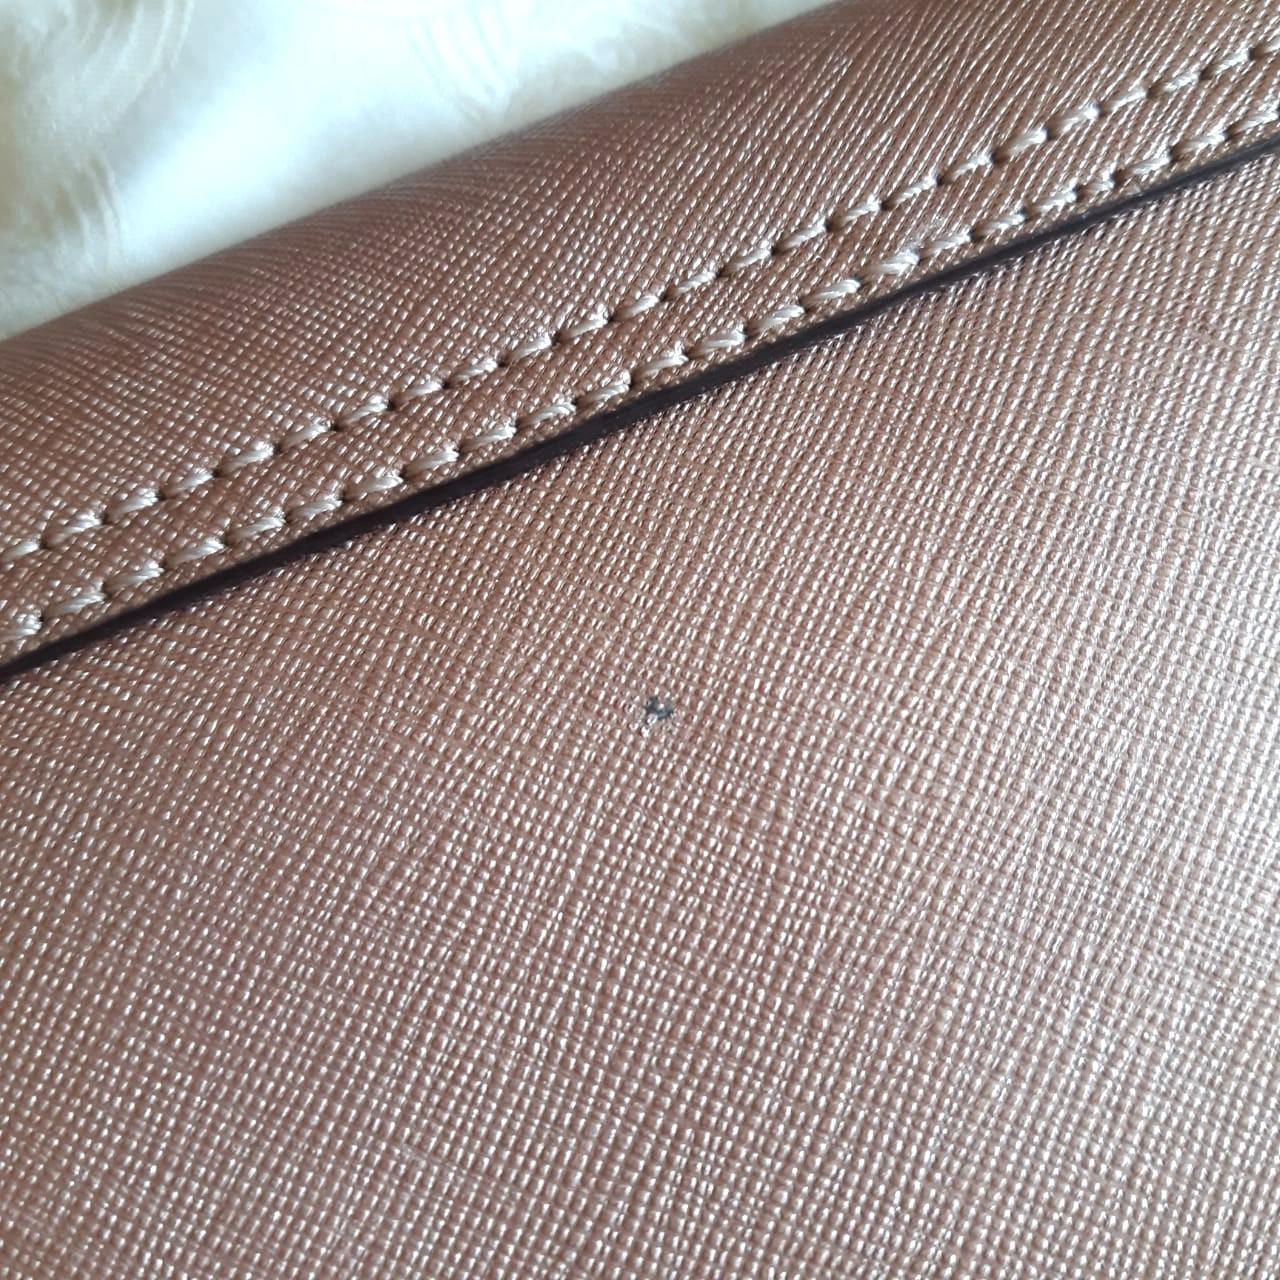 Kate Spade Rose gold saffiano Sally Newbury Lane Small crossbody bag ORIGINAL from store (preloved clean)